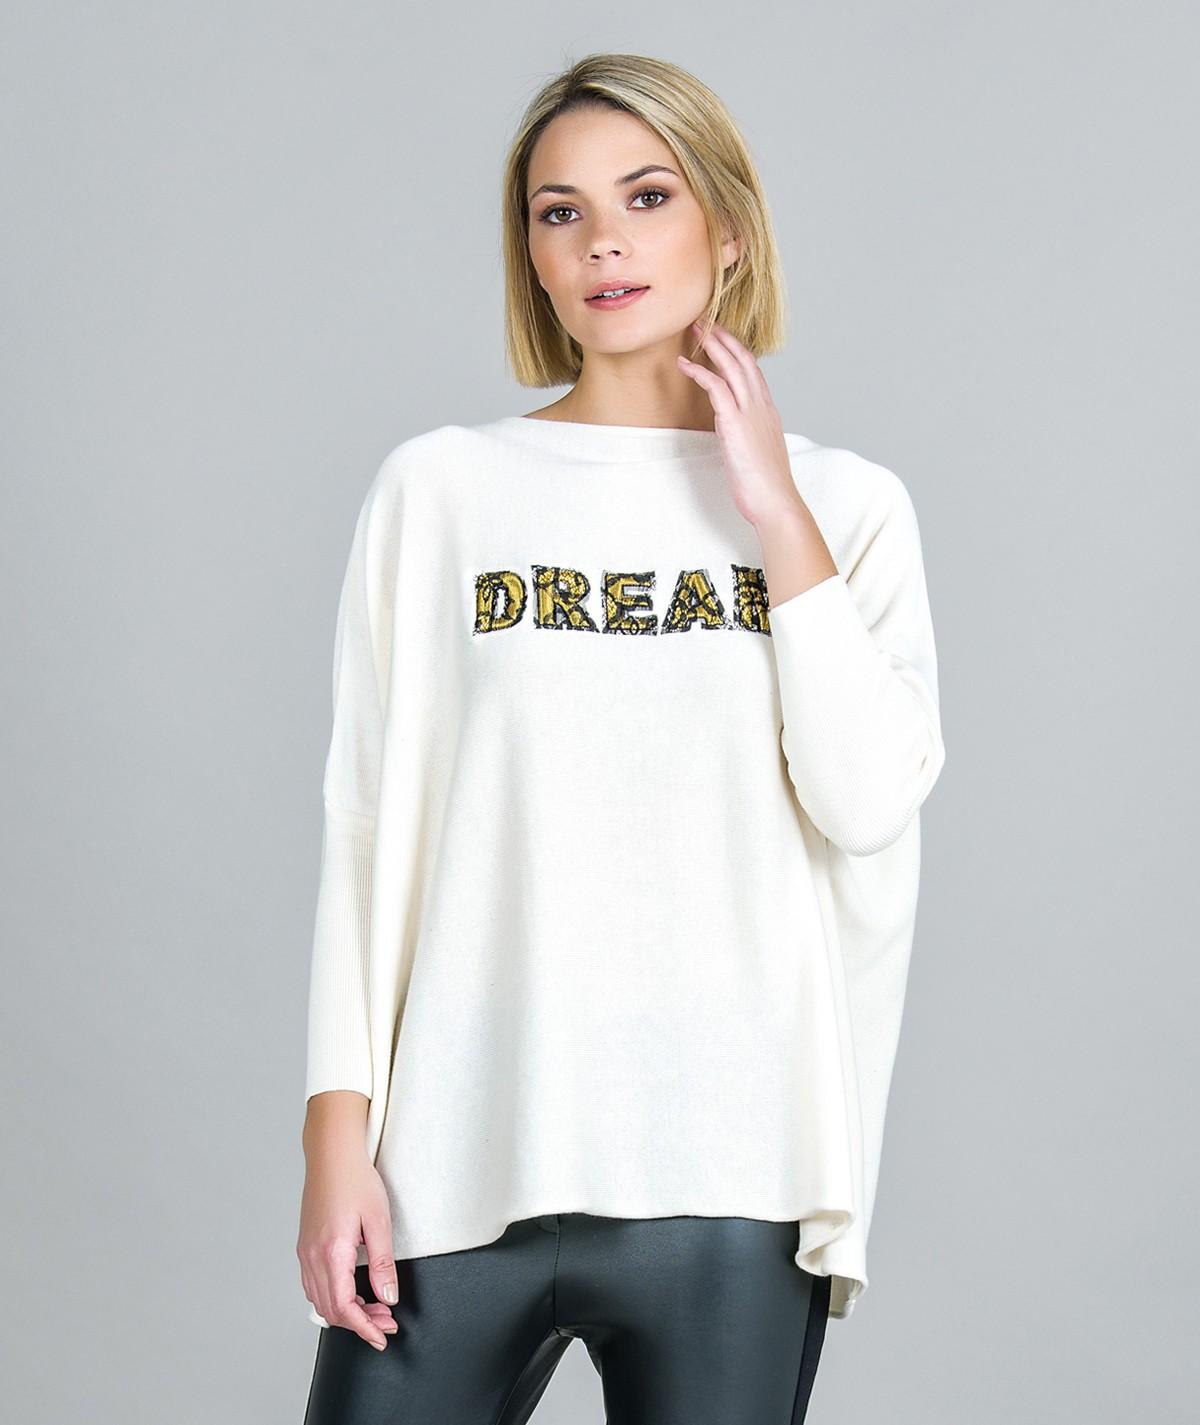 Camisola Motivo Dream